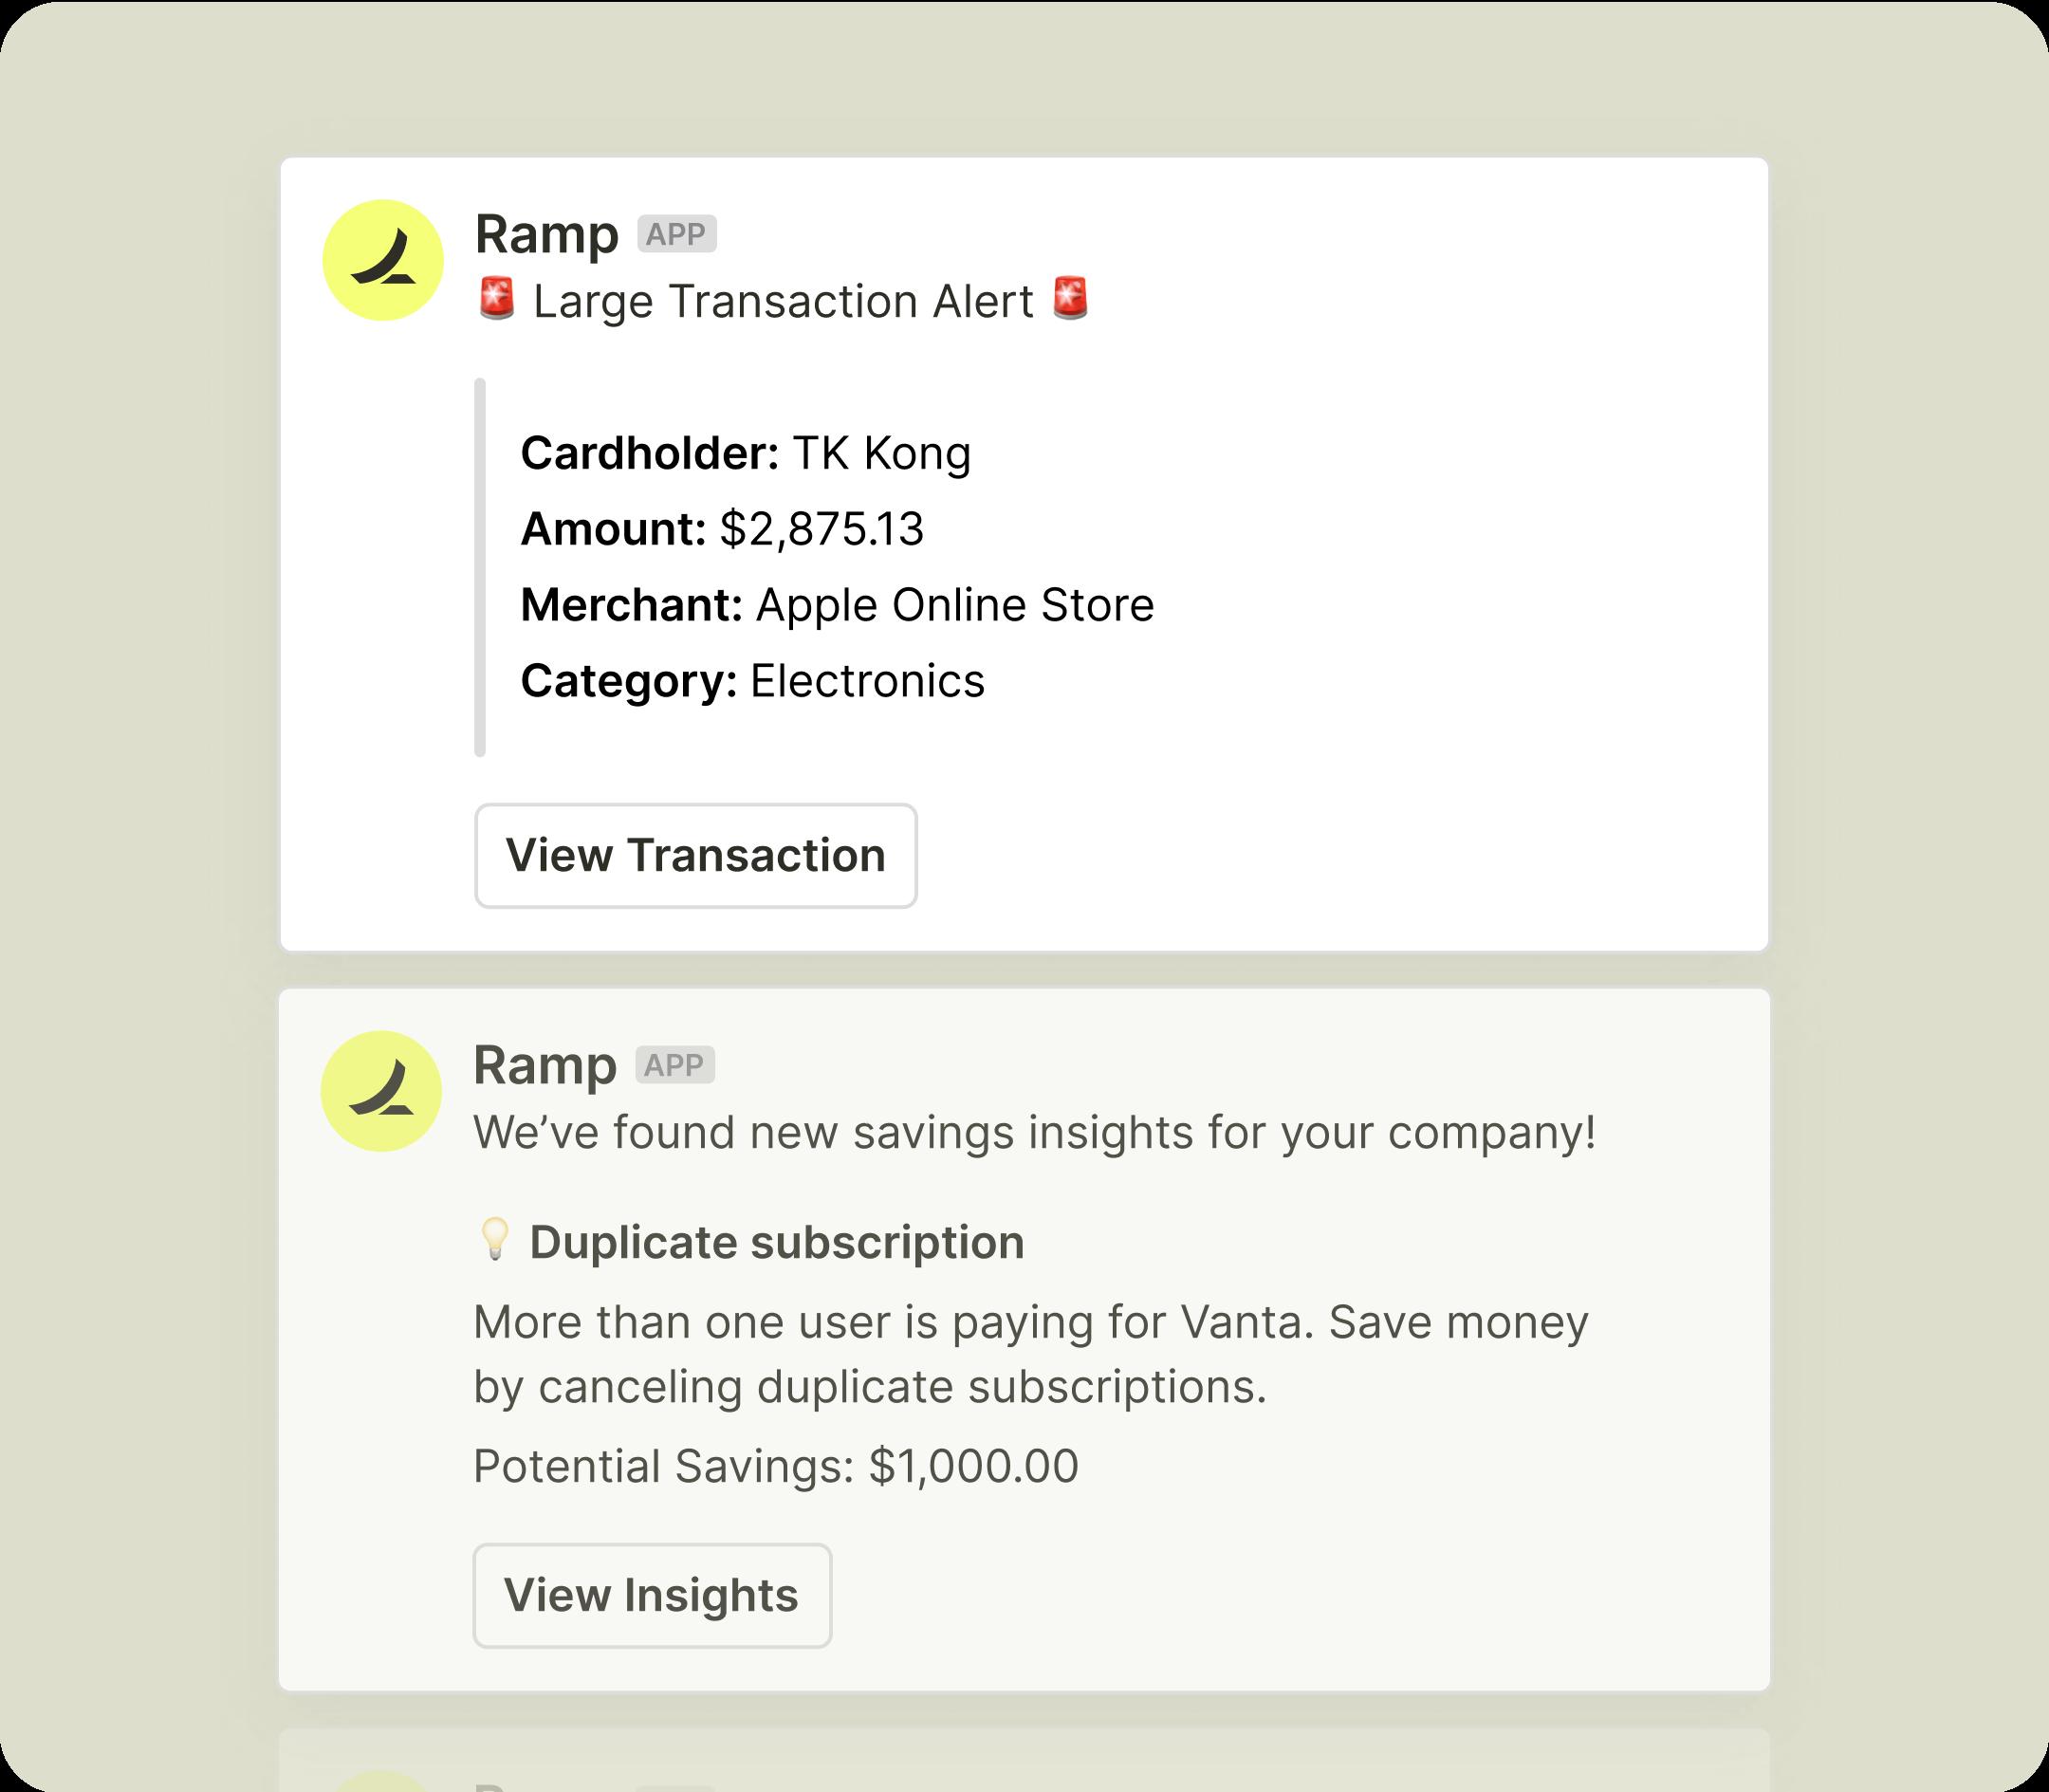 Ramp Notifications